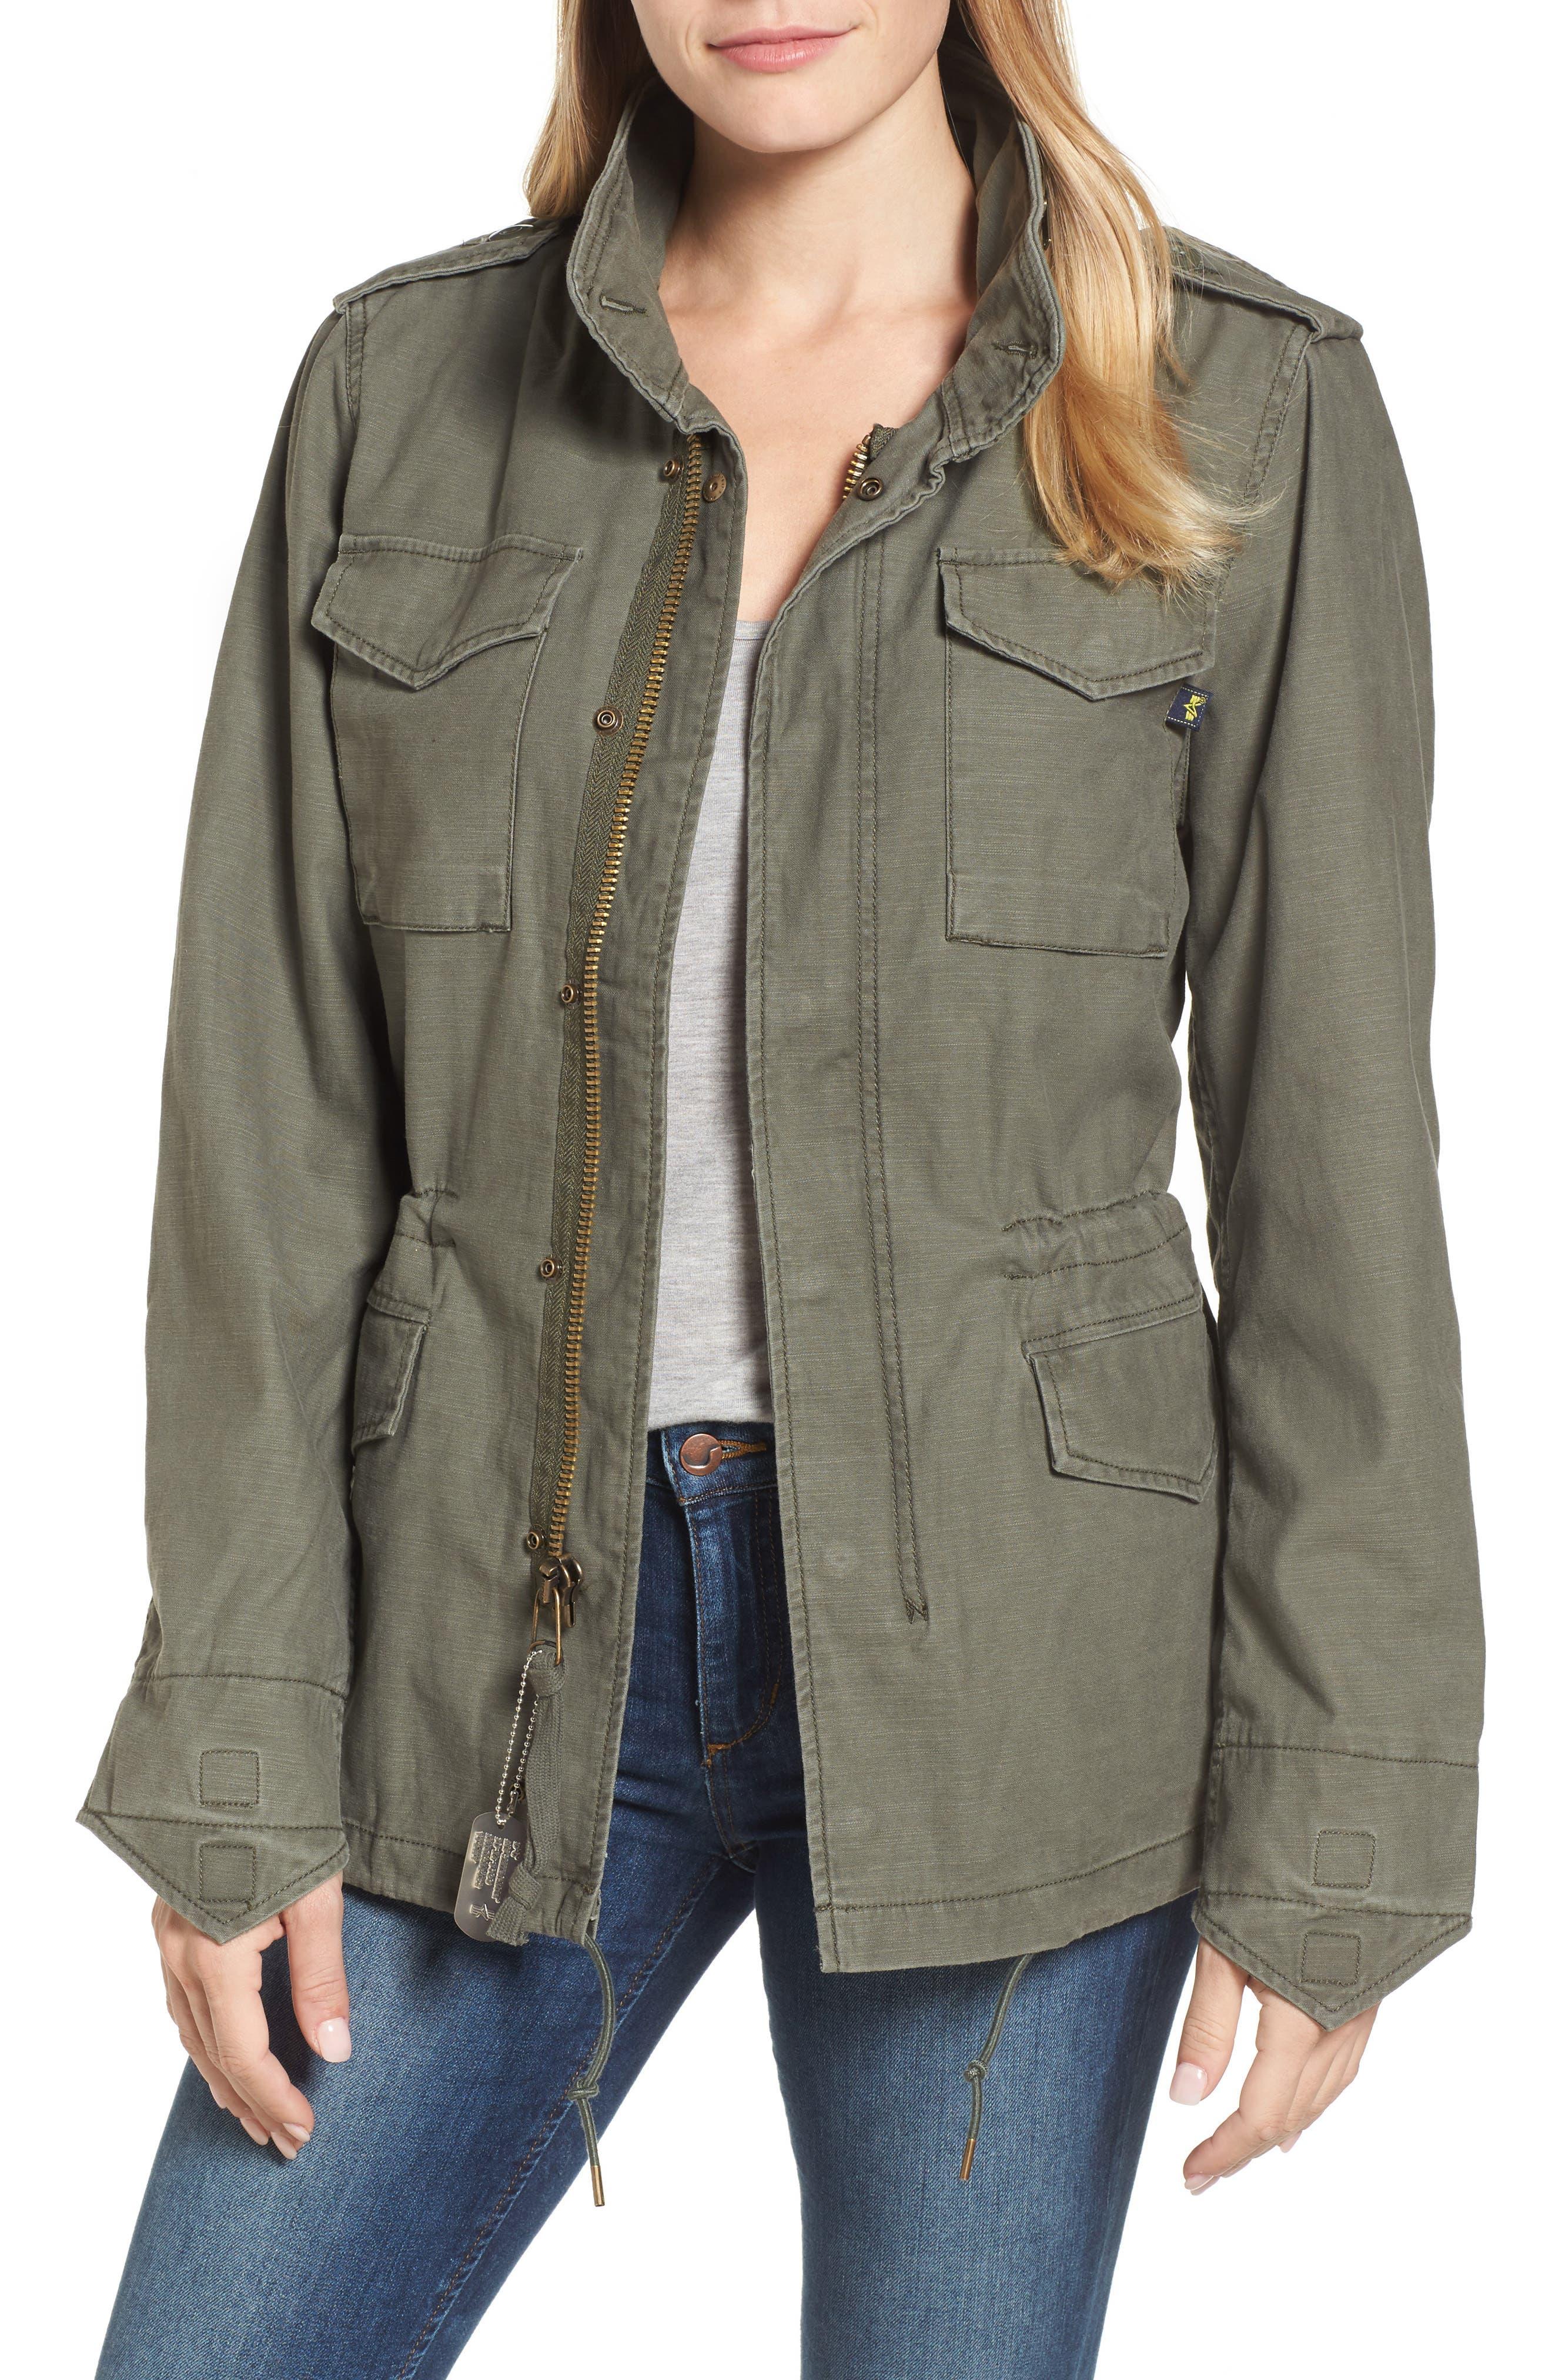 M-65 Defender Camo Field Jacket,                         Main,                         color, Olive